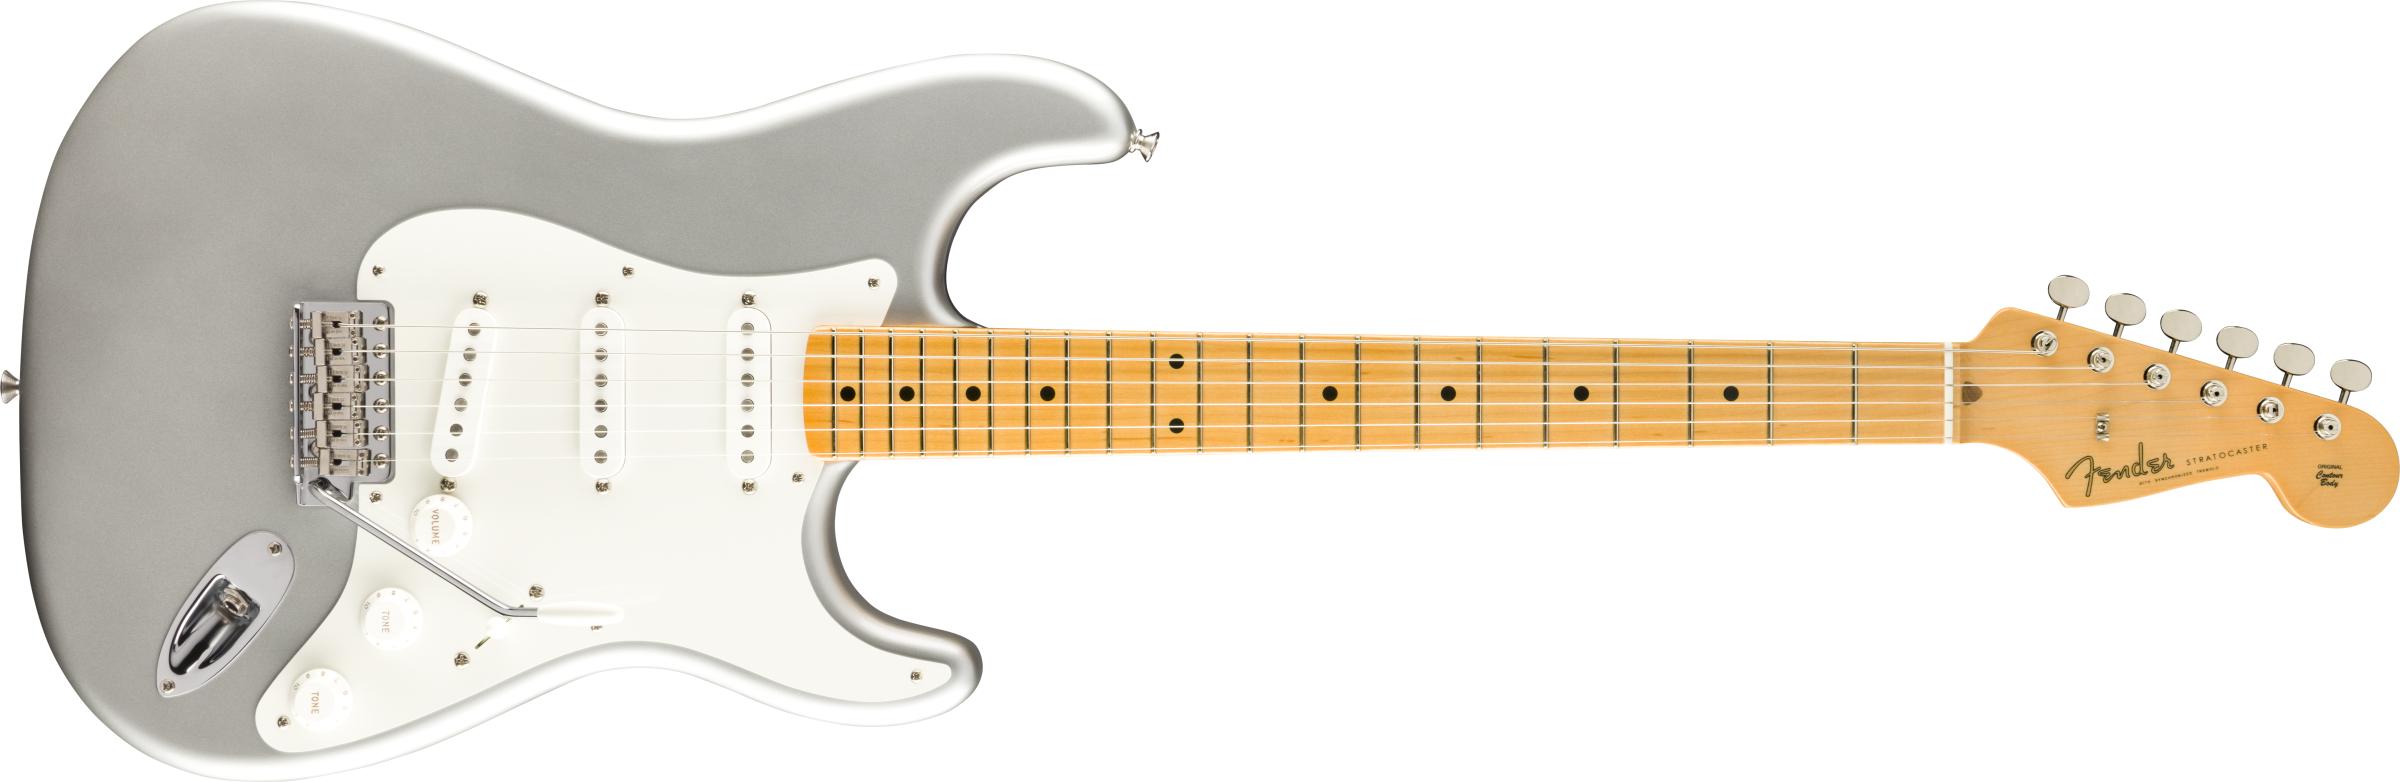 FENDER-American-Original-50s-Stratocaster-Maple-Fingerboard-Inca-Silver-sku-571004445